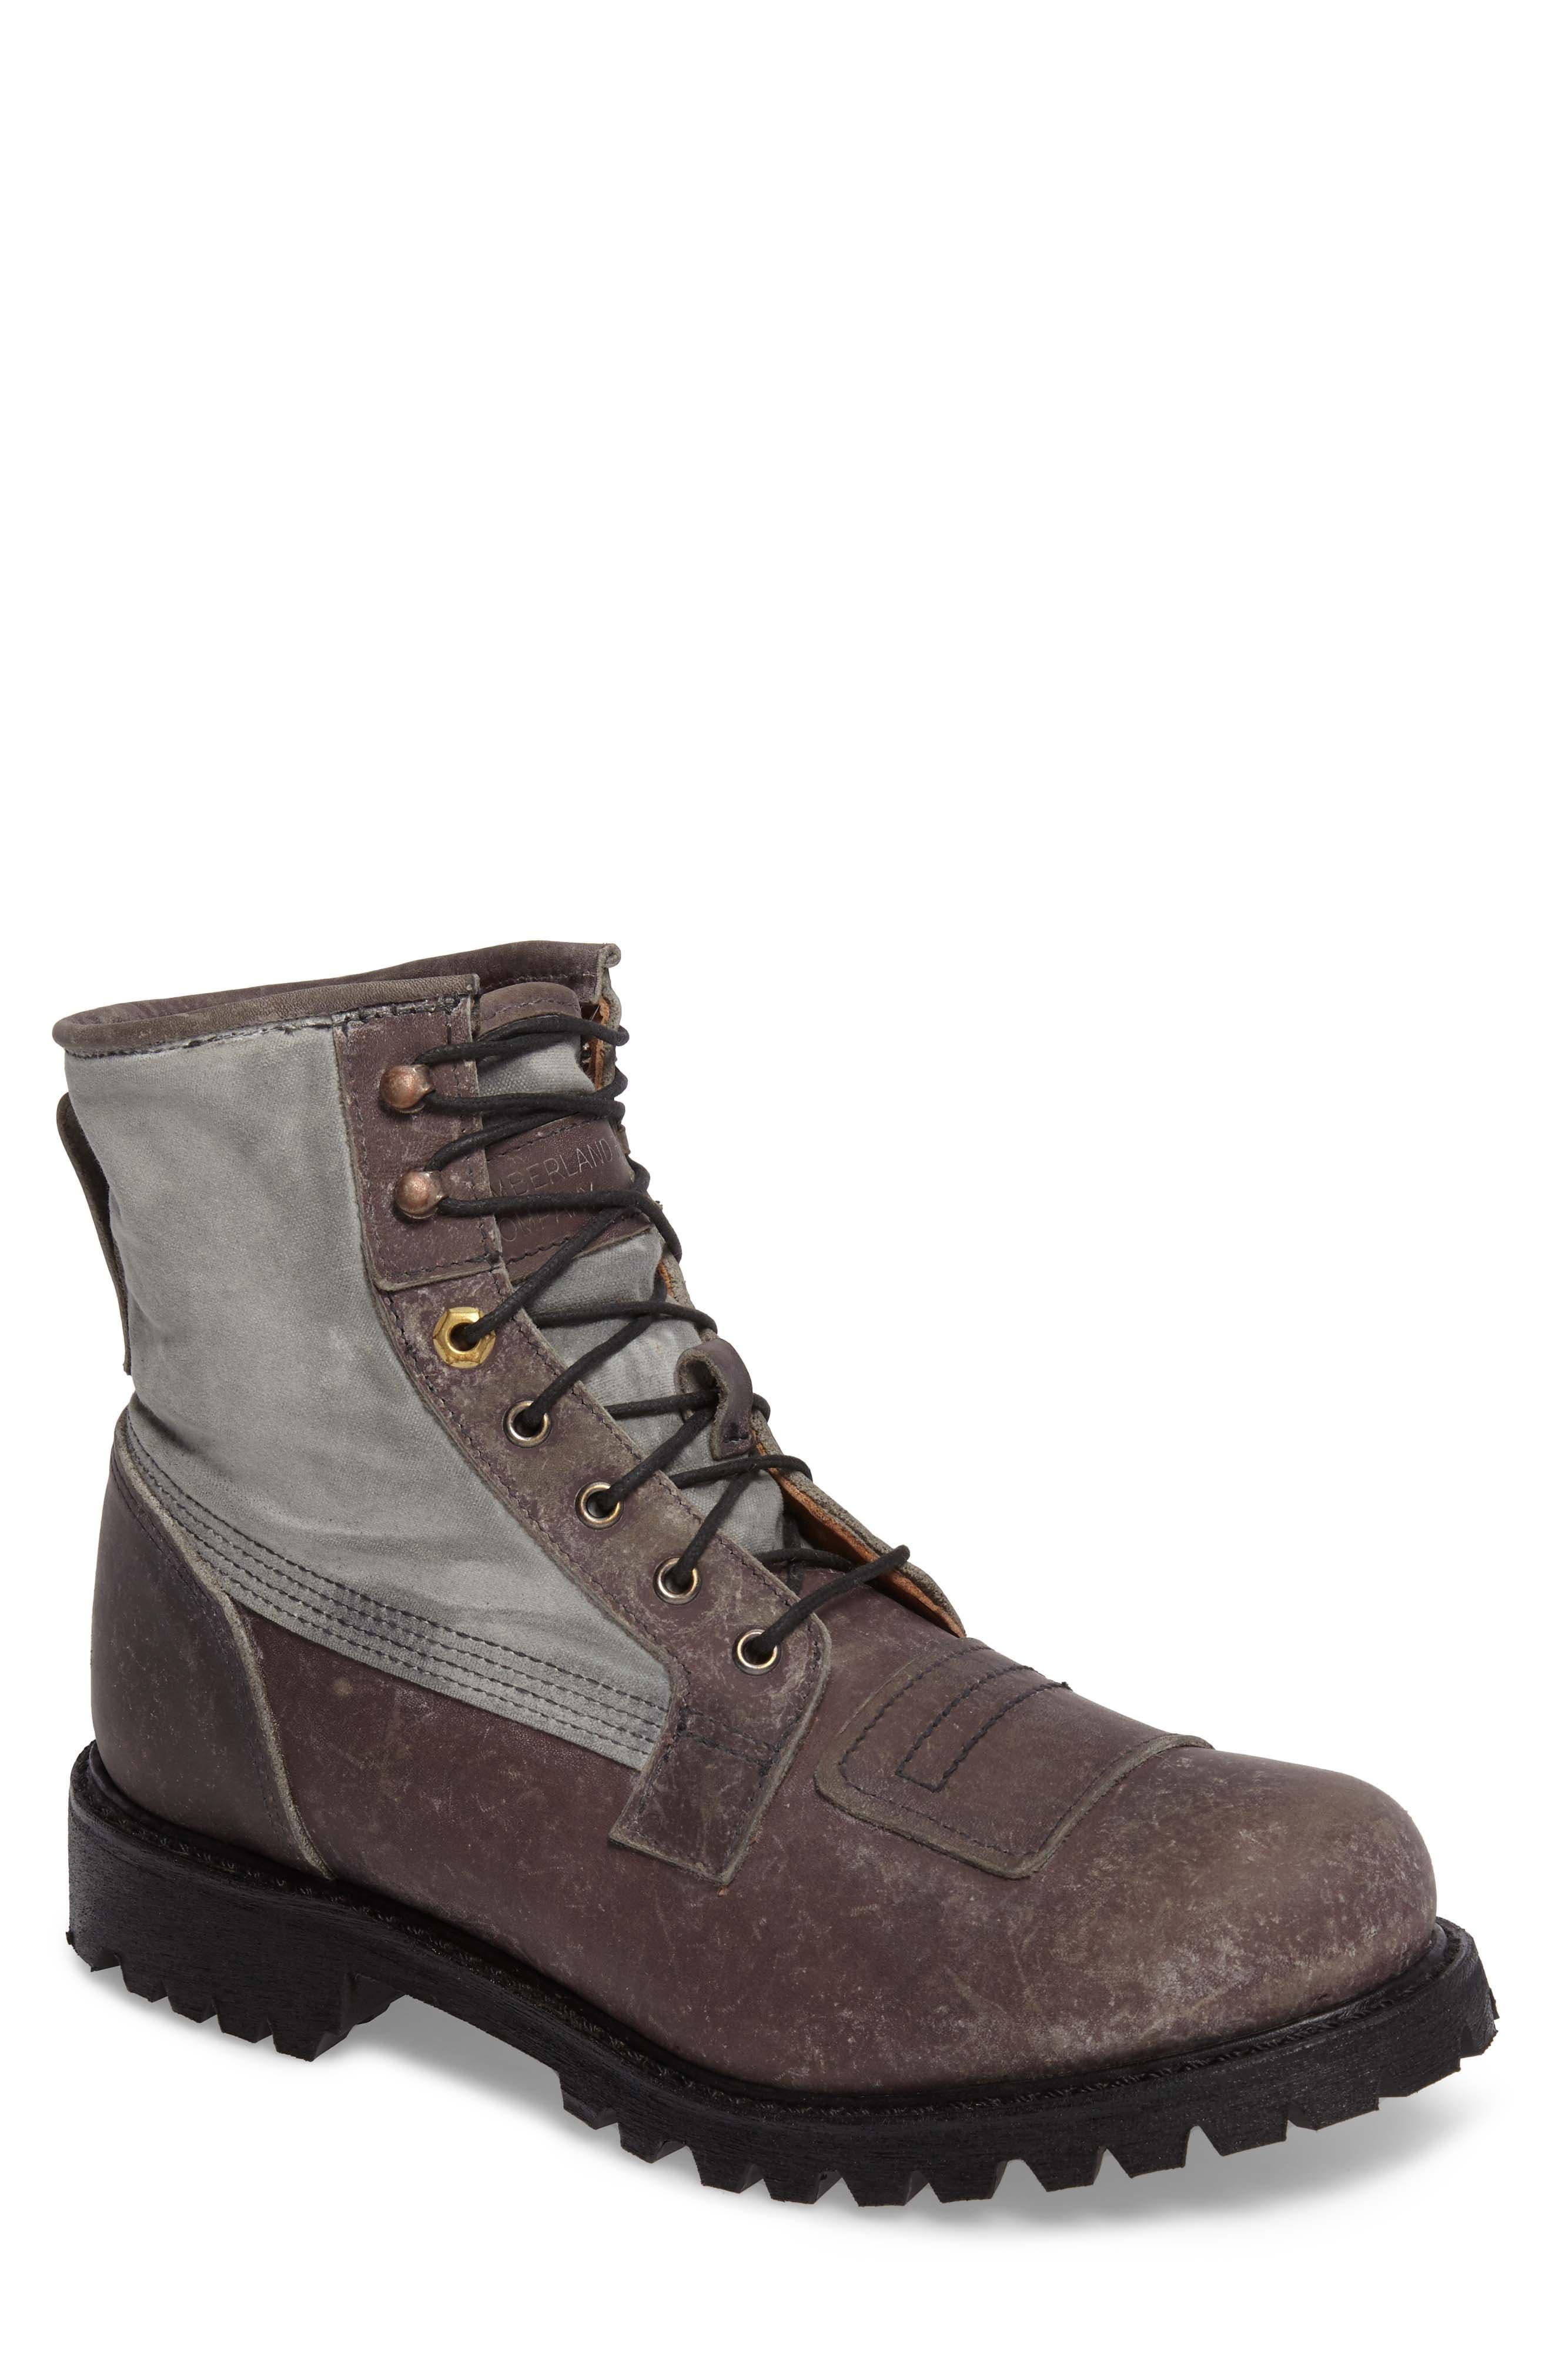 Smuggler's Notch Boot,                         Main,                         color, Dark Grey Boundry